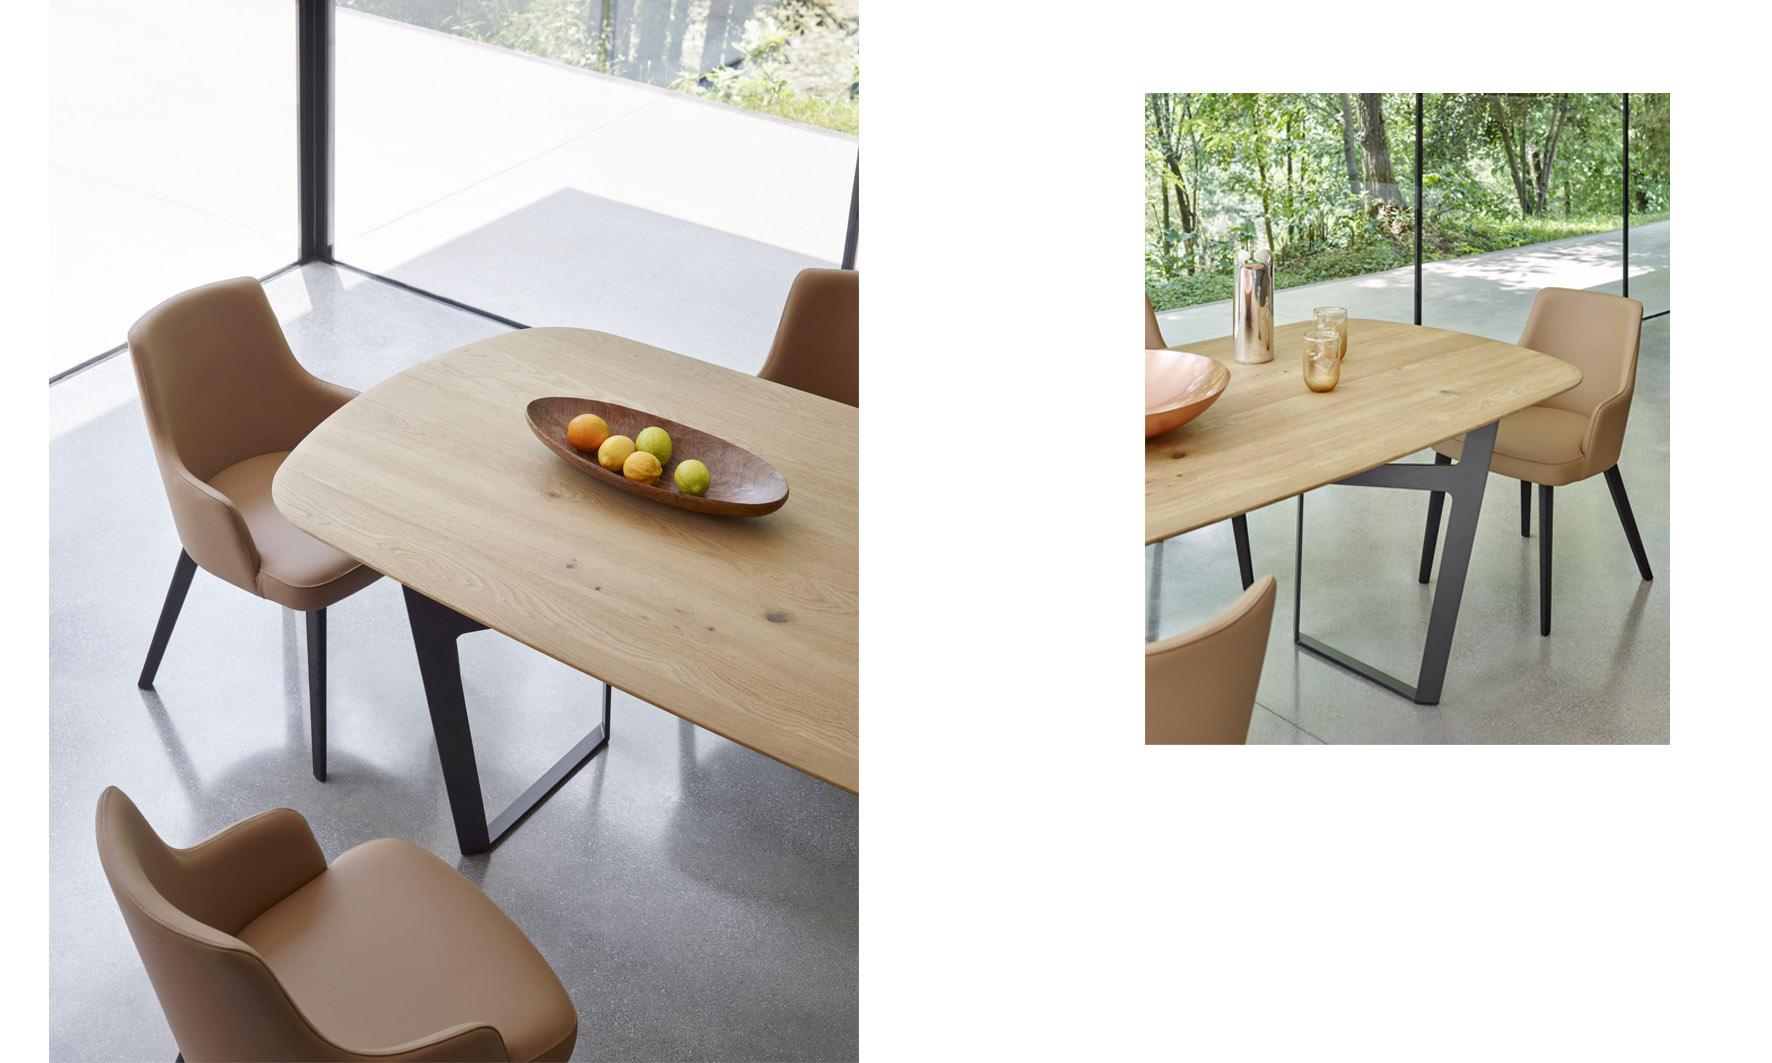 Tavoli Da Giardino In Legno Obi.Sedia Sdraio Obi 30 Sbalorditivo Sedie Sdraio Brico Banat Kamla